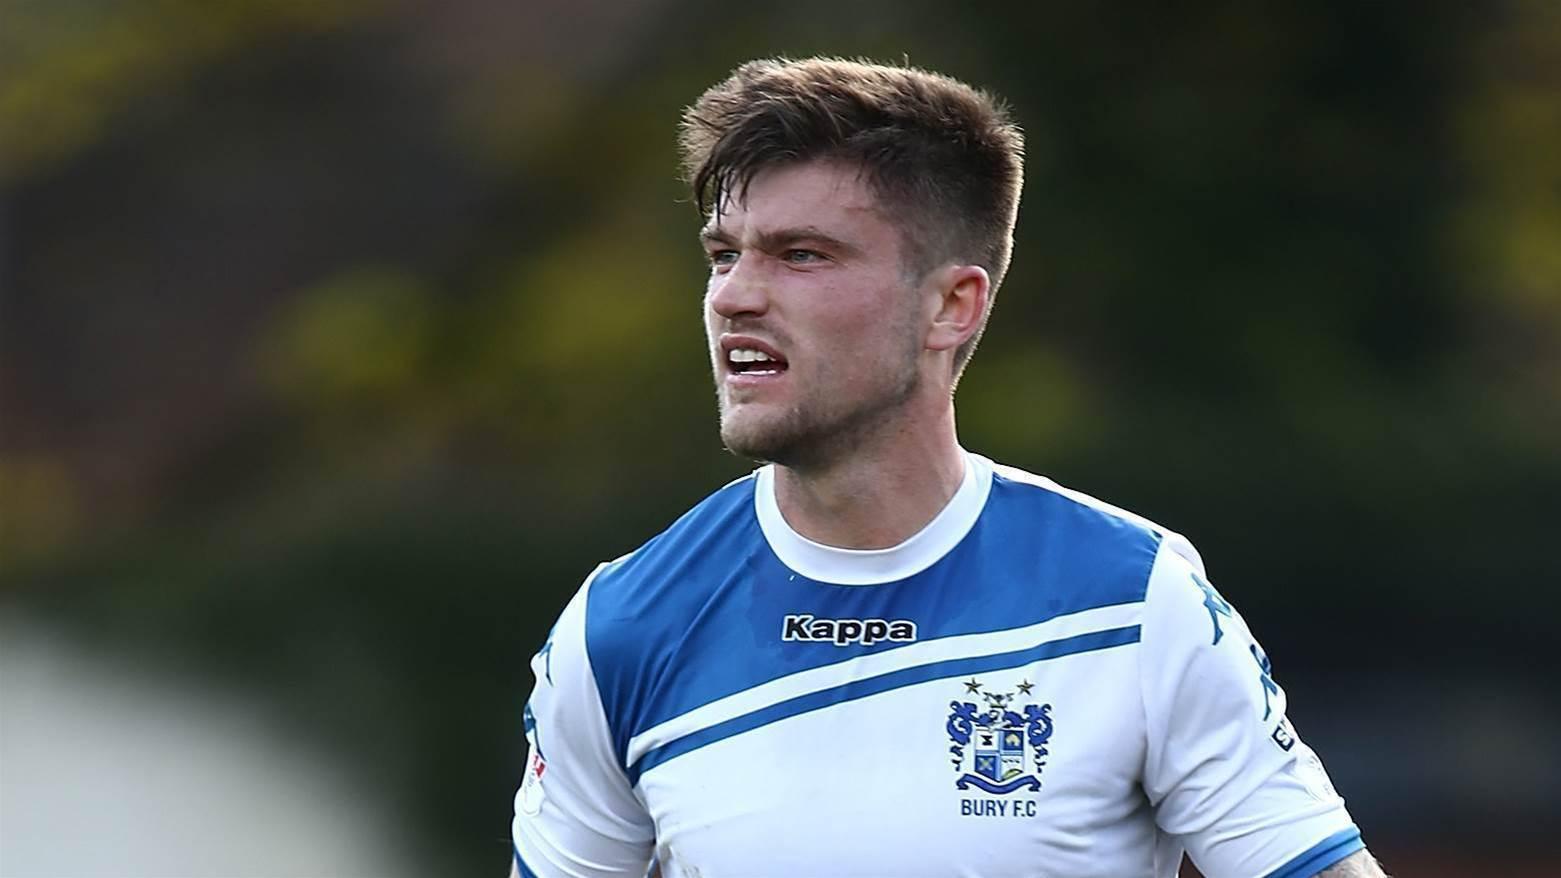 Burgess to follow Irvine's journey